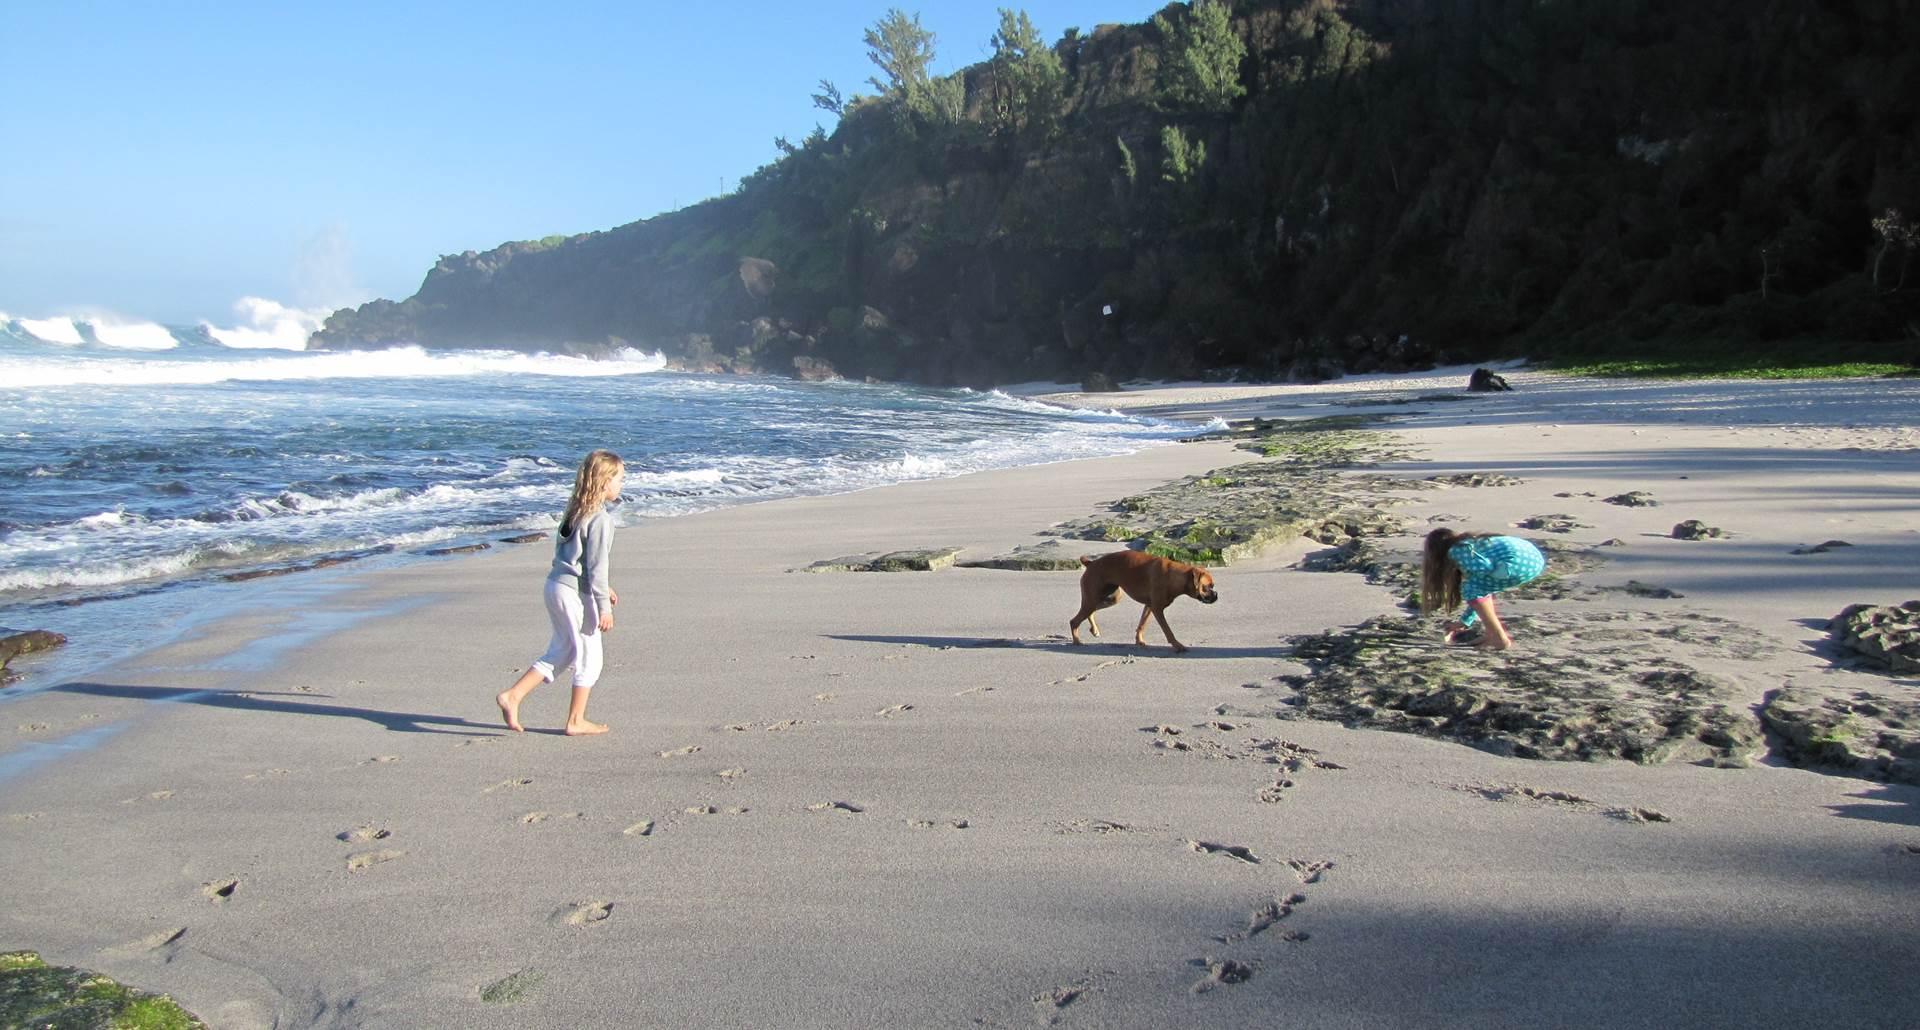 plage de l'océan indien